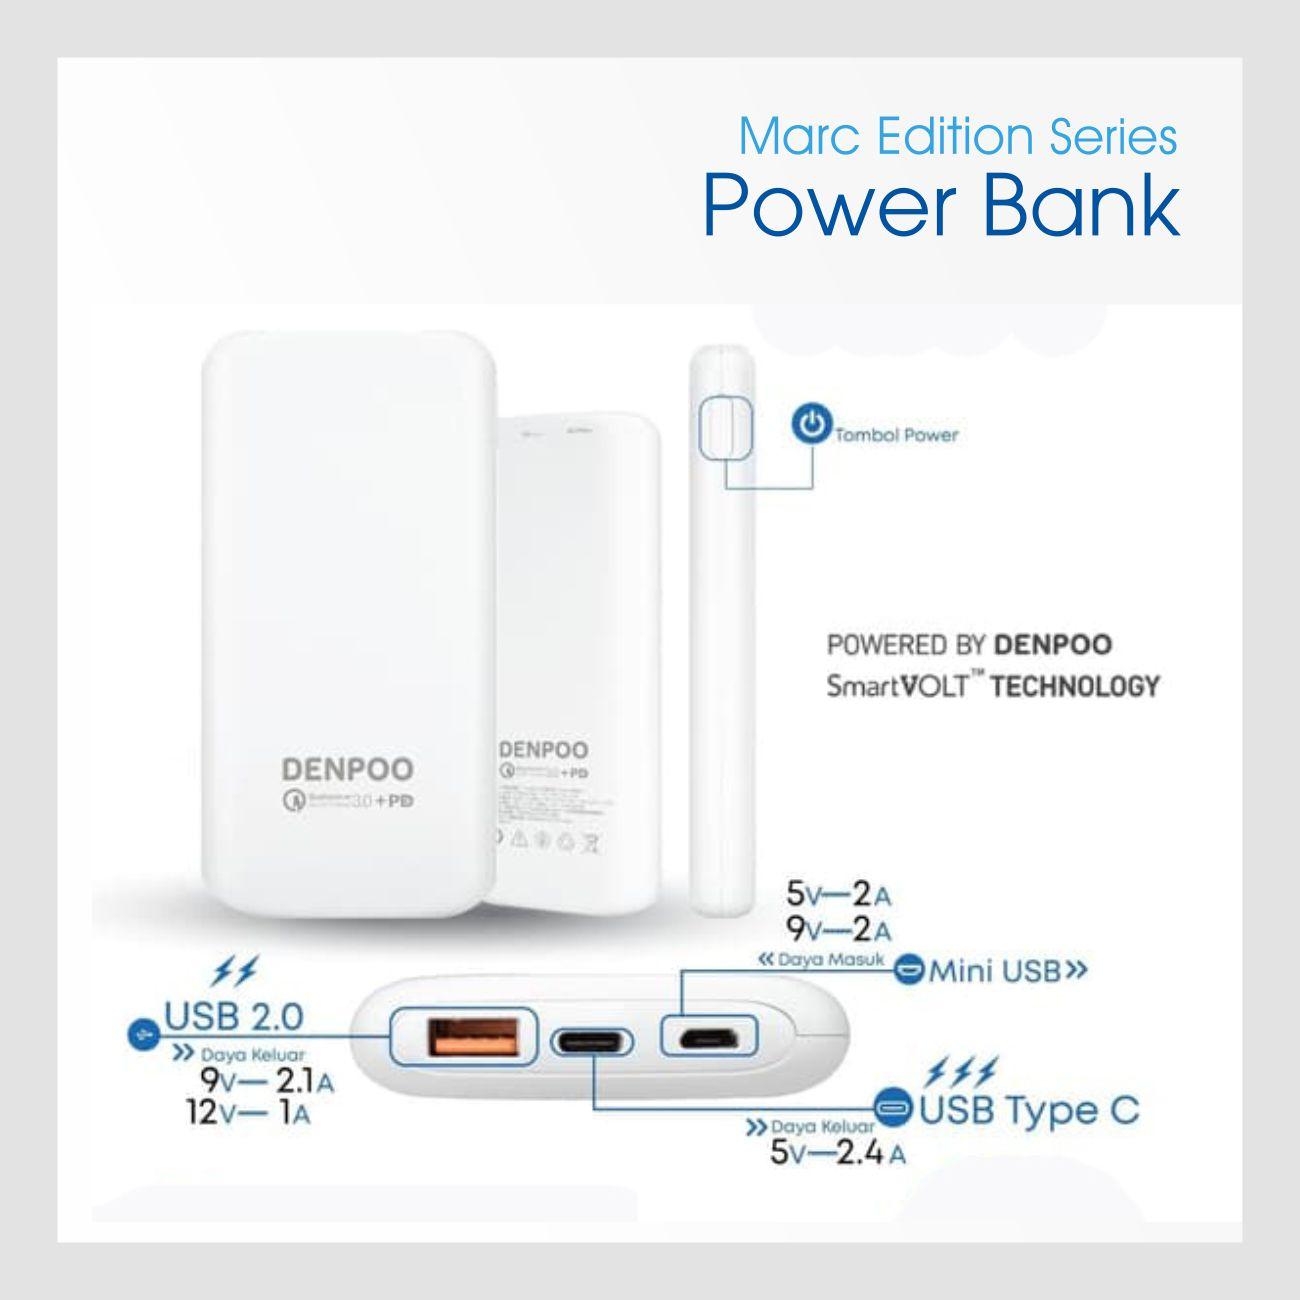 PowerBank (Marc Edition) 6